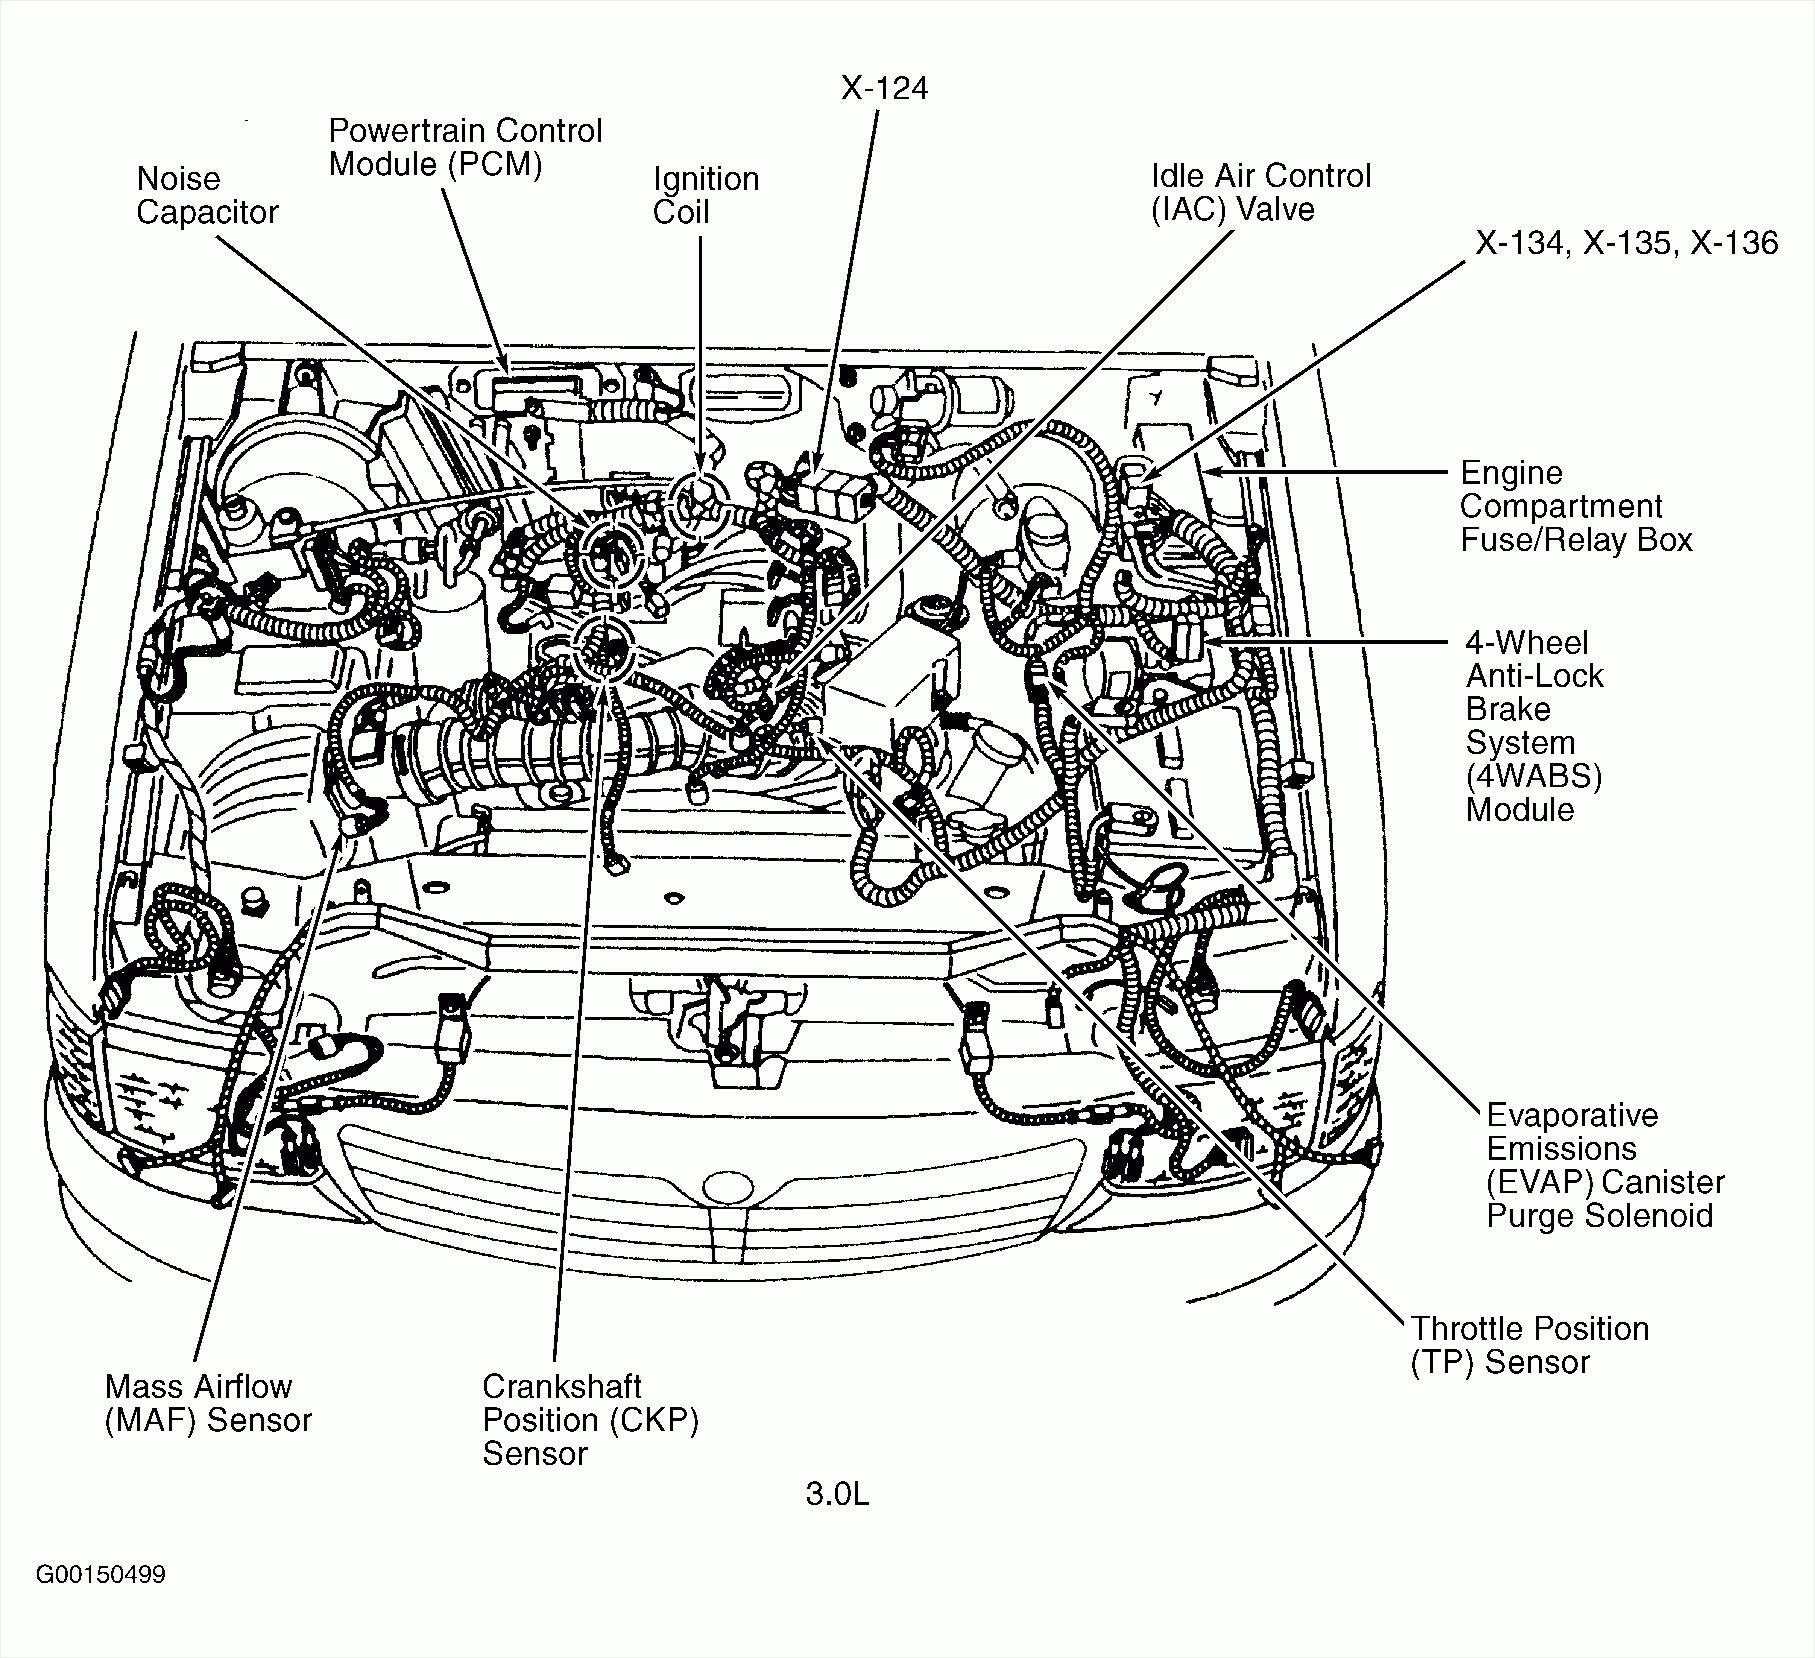 2002 Mazda Tribute Engine Diagram Mazda Engine Schematics Wiring Diagram Database Of 2002 Mazda Tribute Engine Diagram